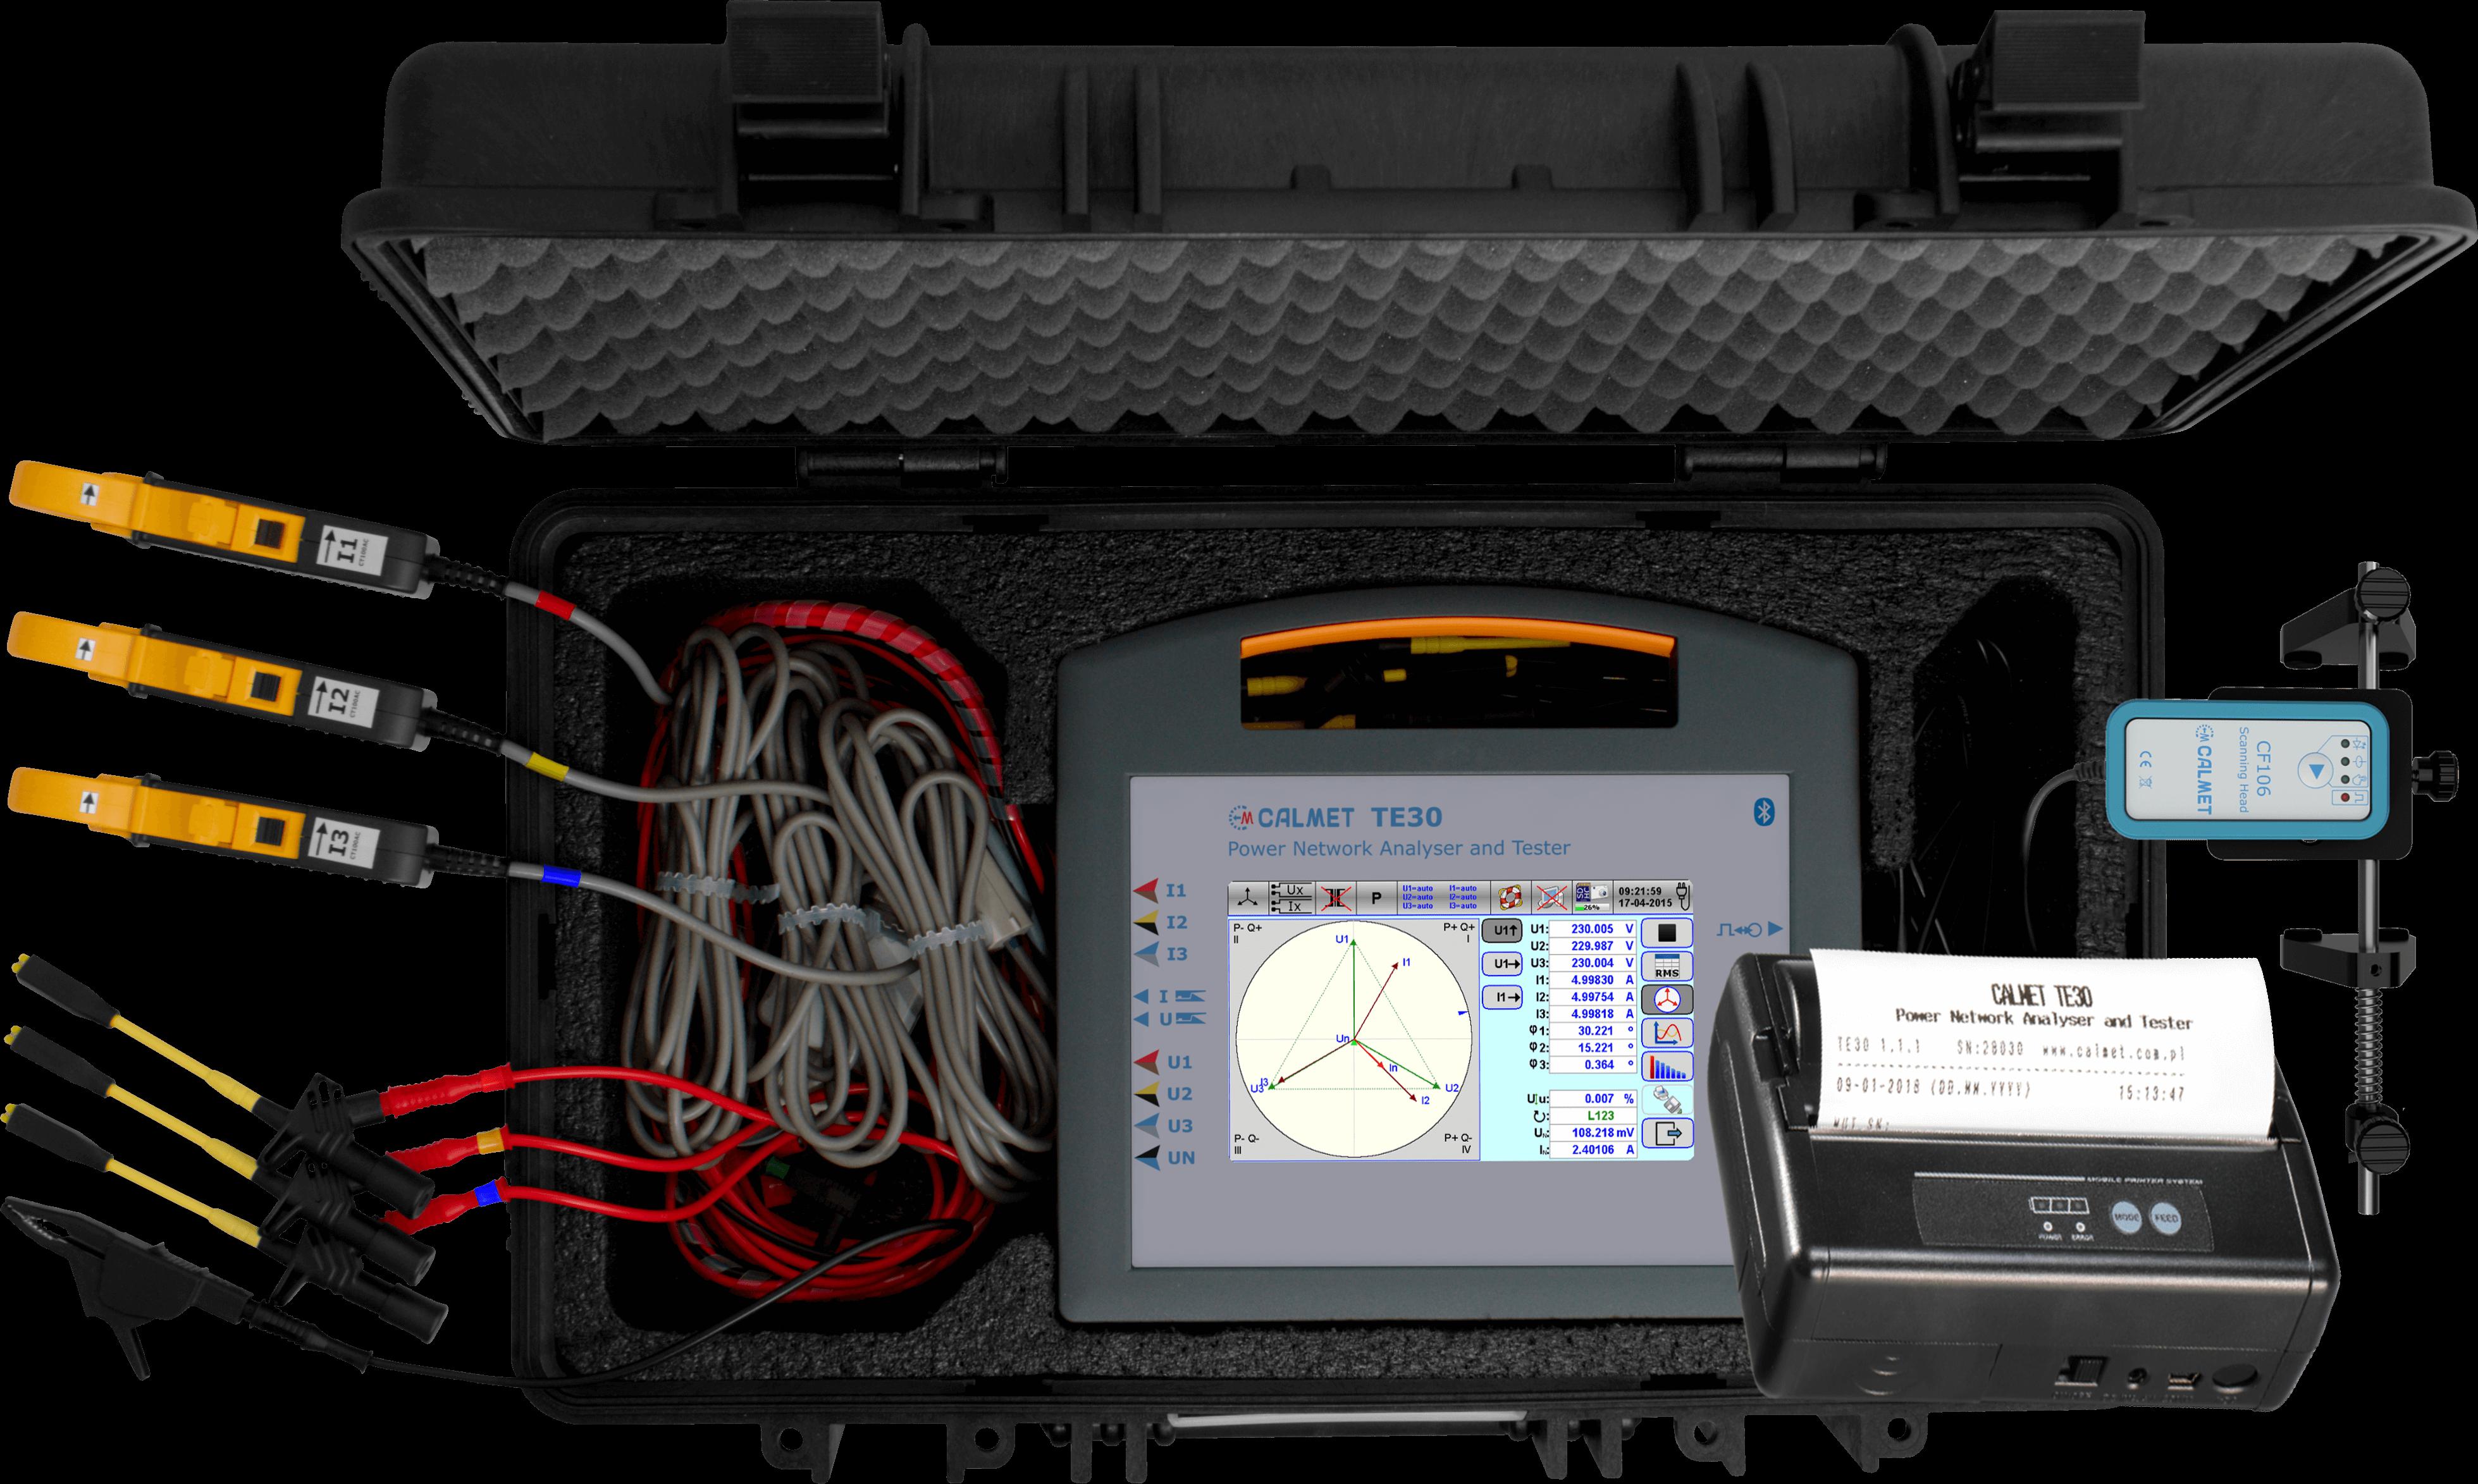 TE30 wth Bluetooth printer